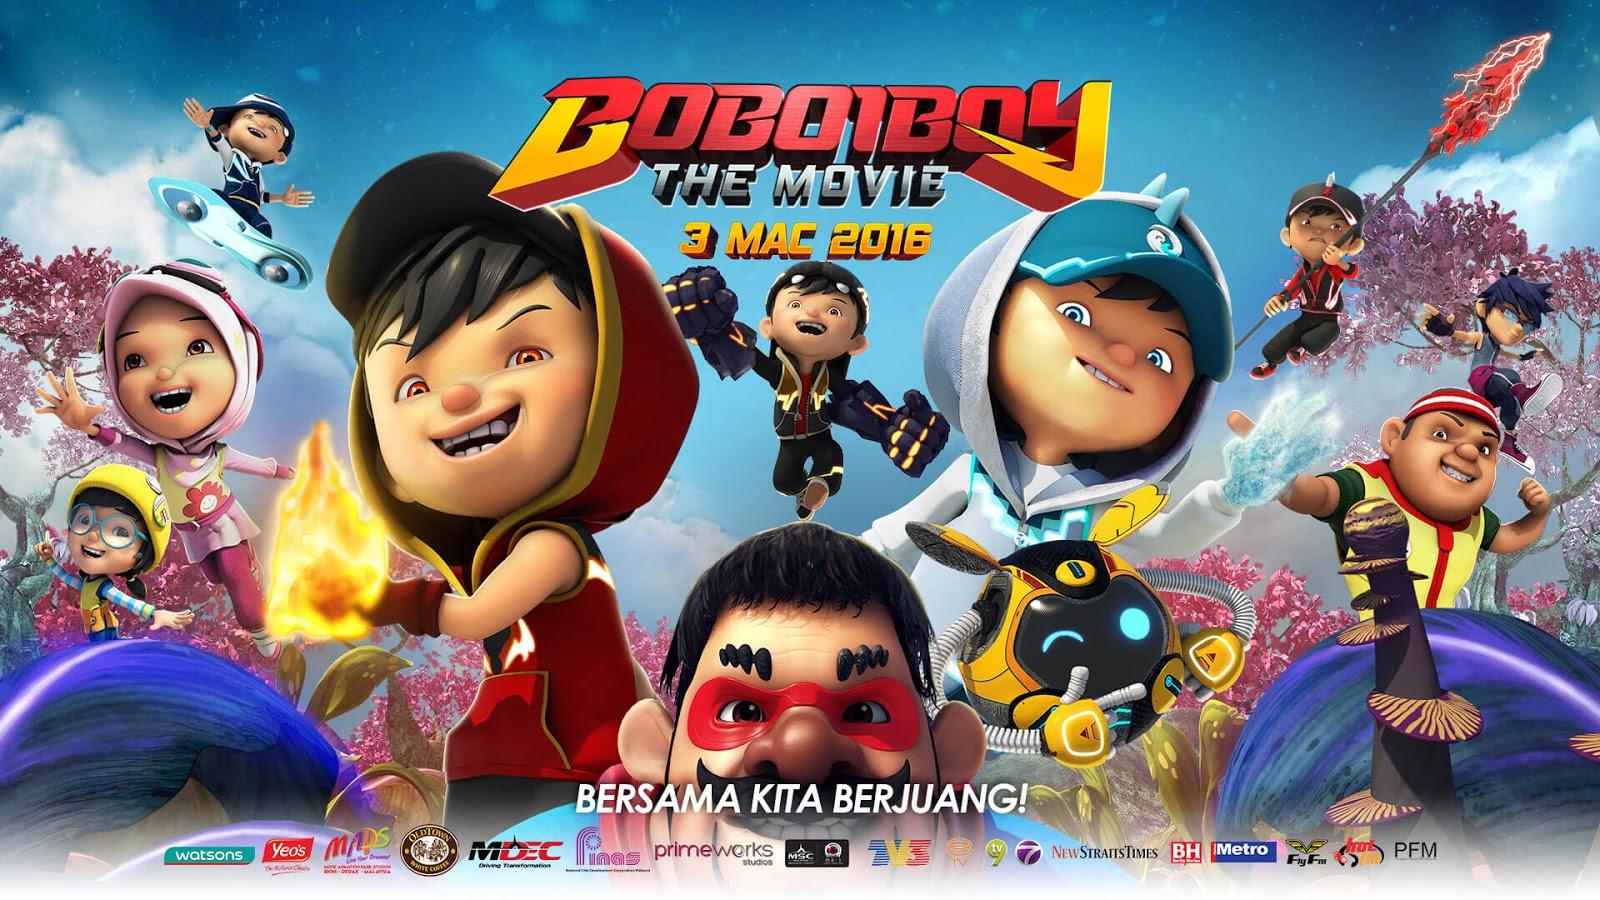 boboiboy the movie [2016] [animation] [asian cartoon] [dvdrip 720p